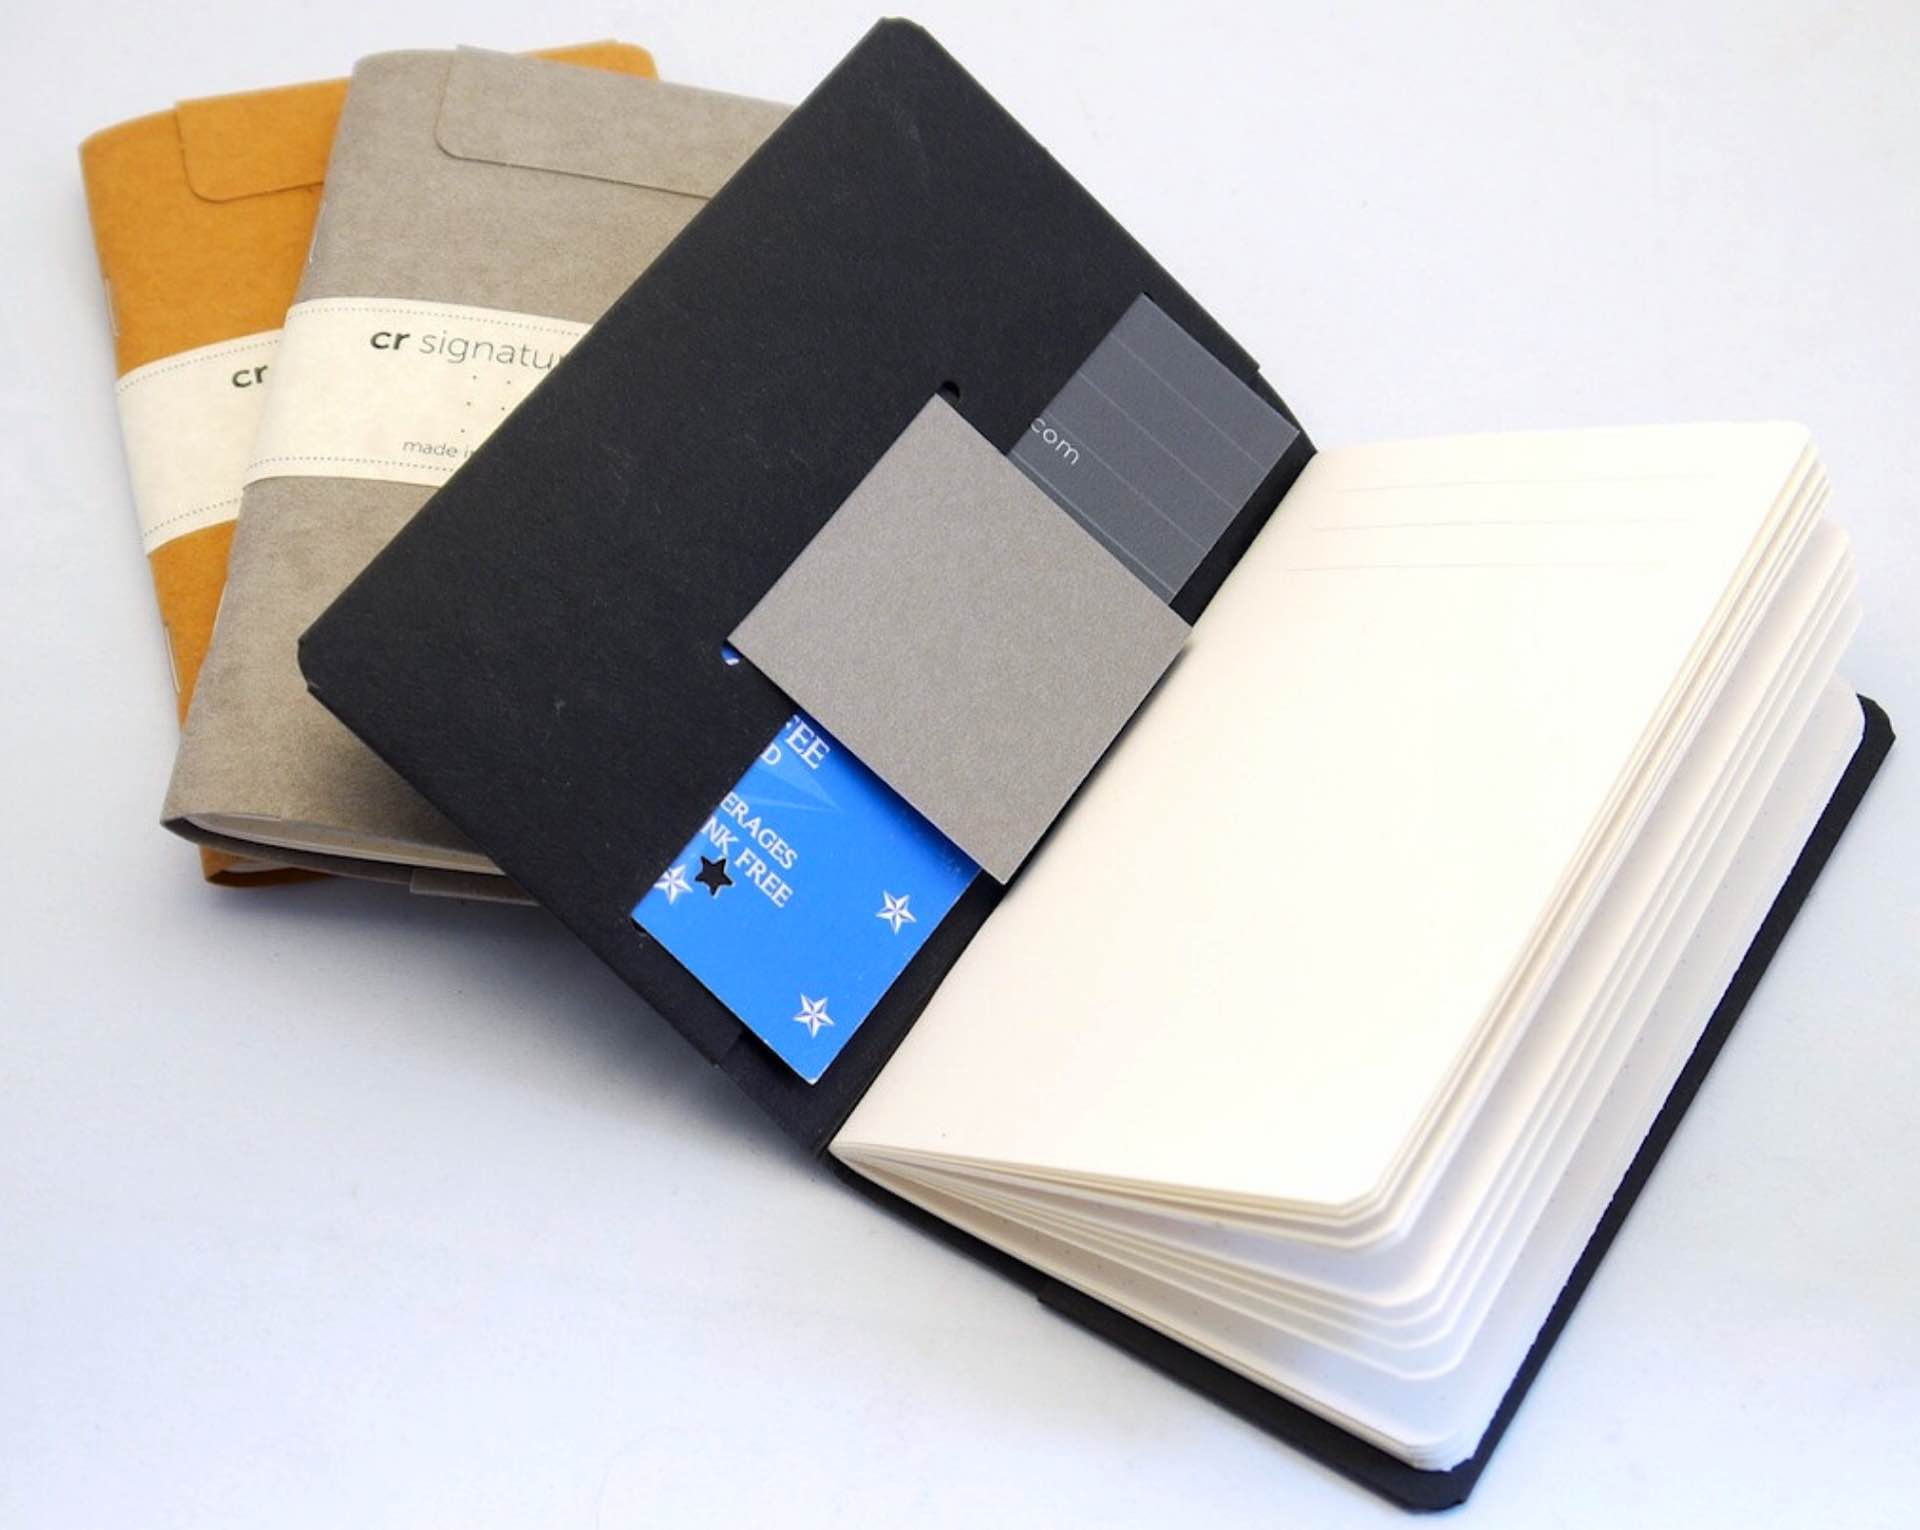 cr-brand-signature-pocketbook